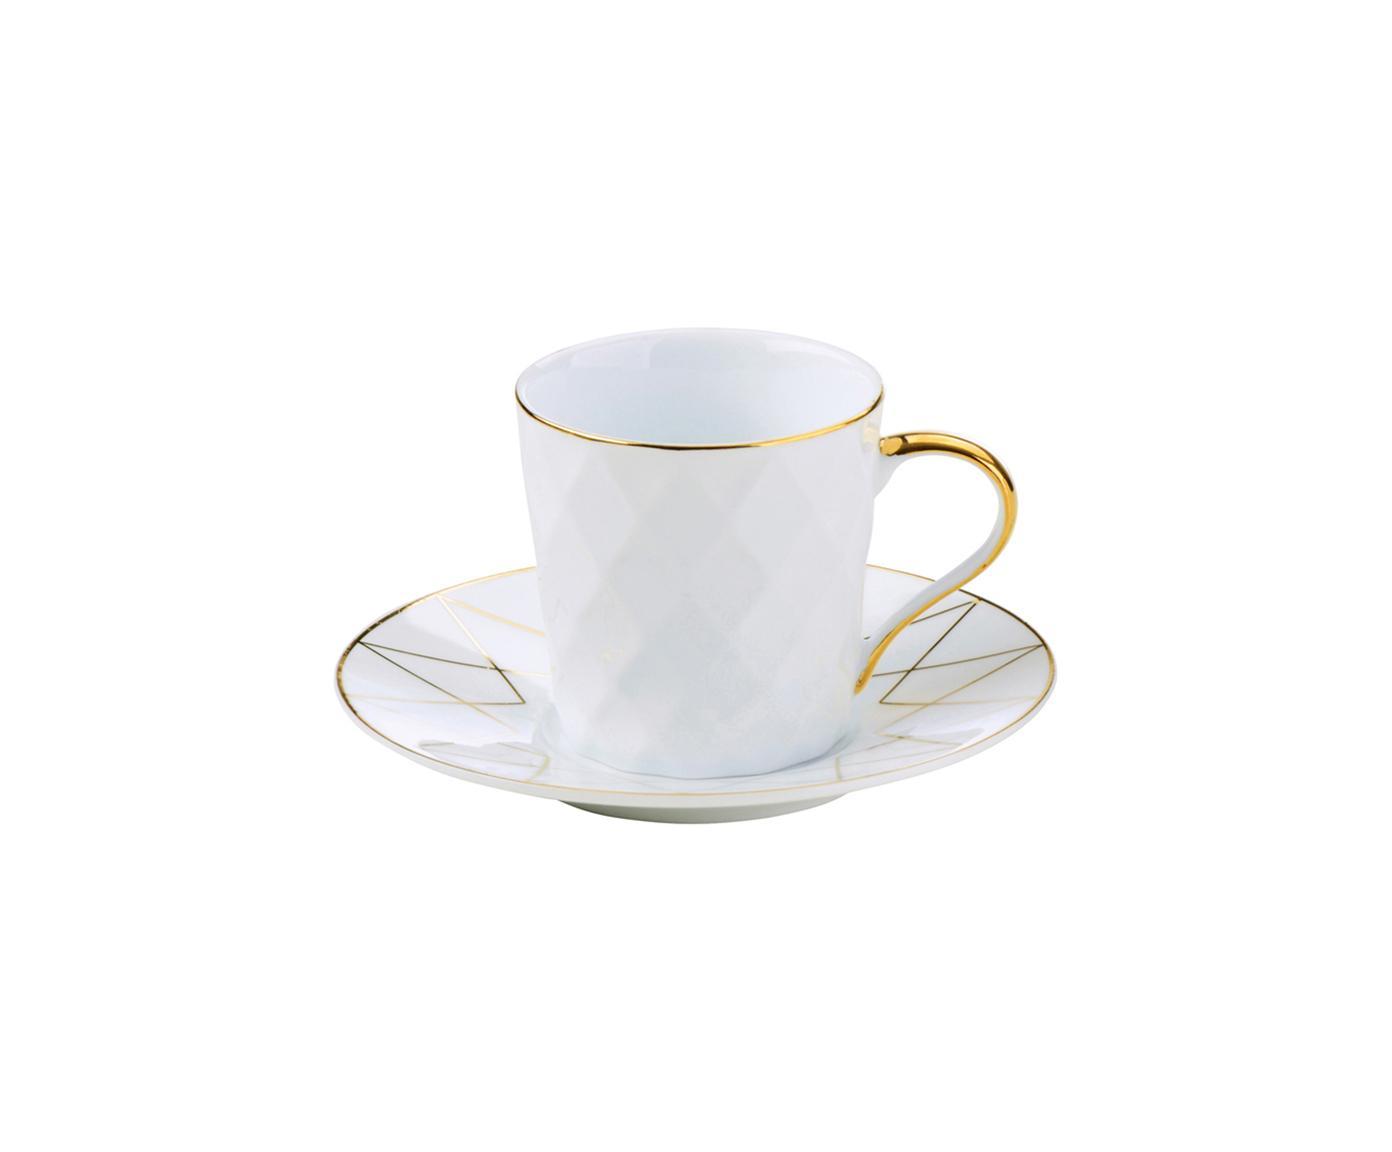 Espressokopjesset Lux, 6-delig, Porselein, Wit, goudkleurig, Ø 12 x H 6 cm